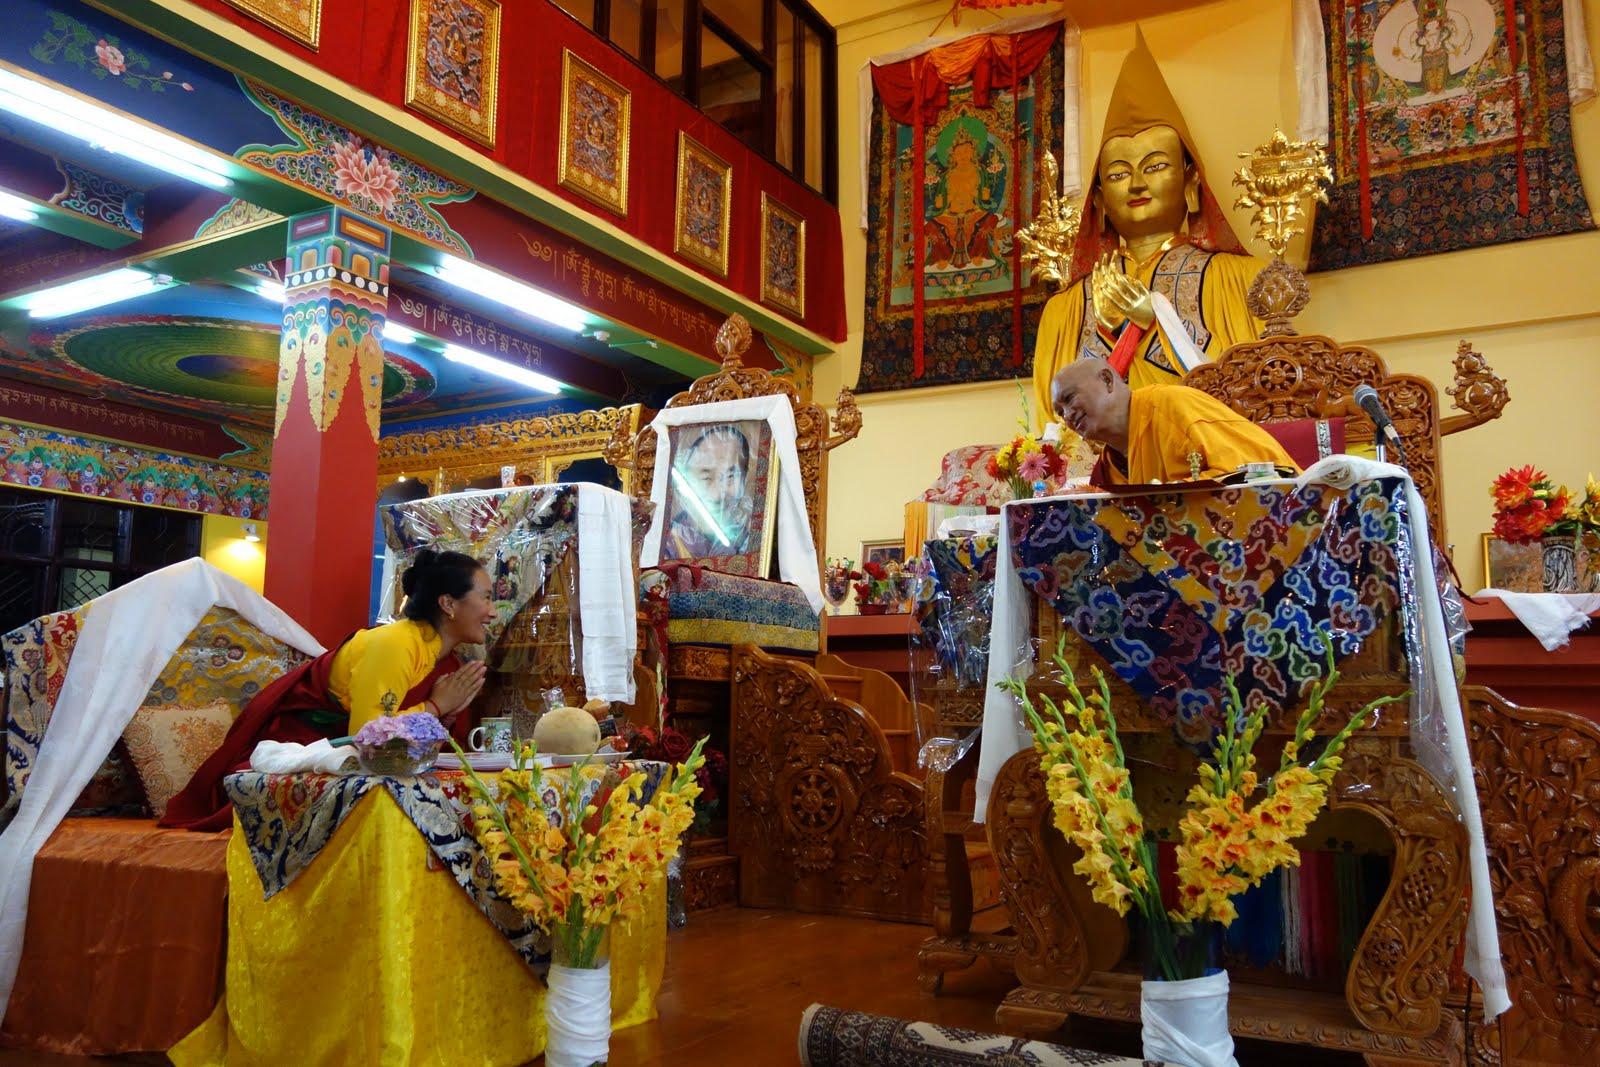 AttheendoftheLamaChopa, June 4, 2013, RinpochewasrequestingKhadro-latogiveashorttalkinTushitagompaMcloedGanj.Photo. Ven. RogerKunsang.